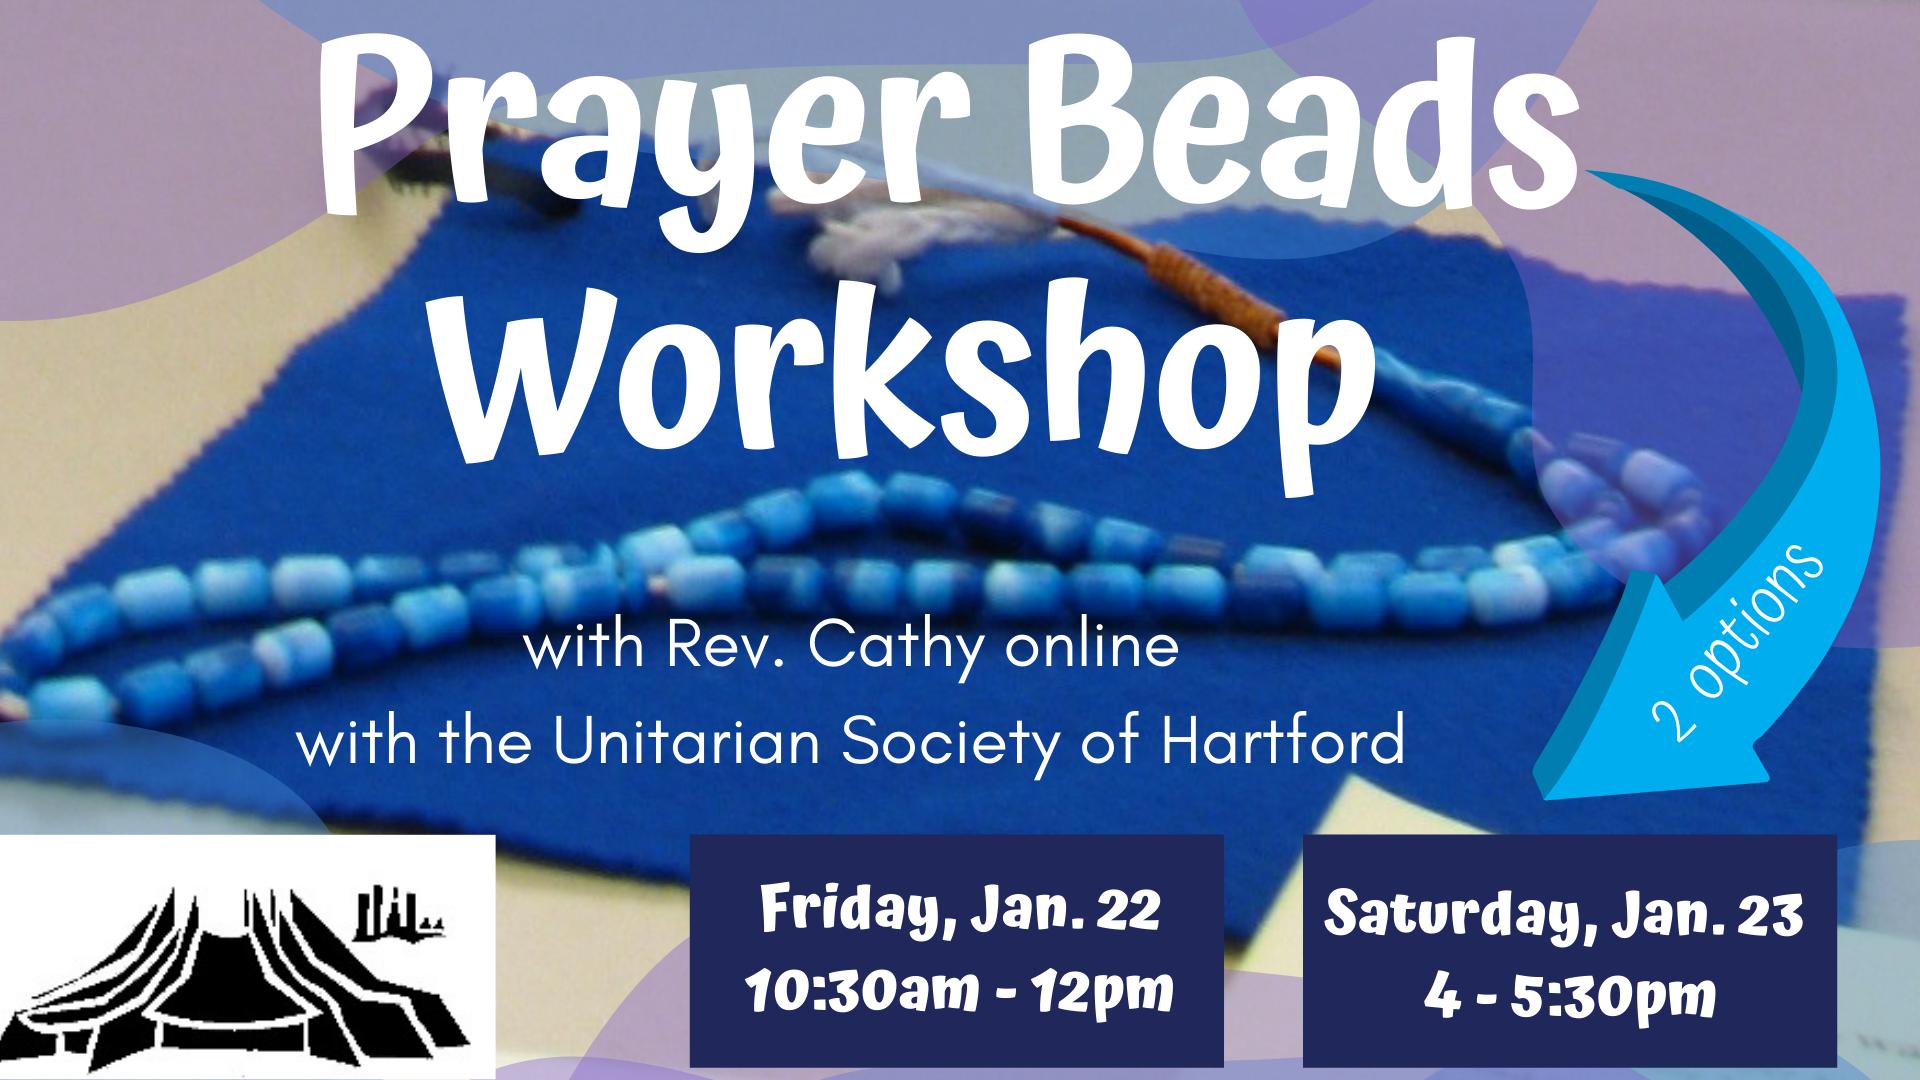 USH Prayer Beads Workshop info